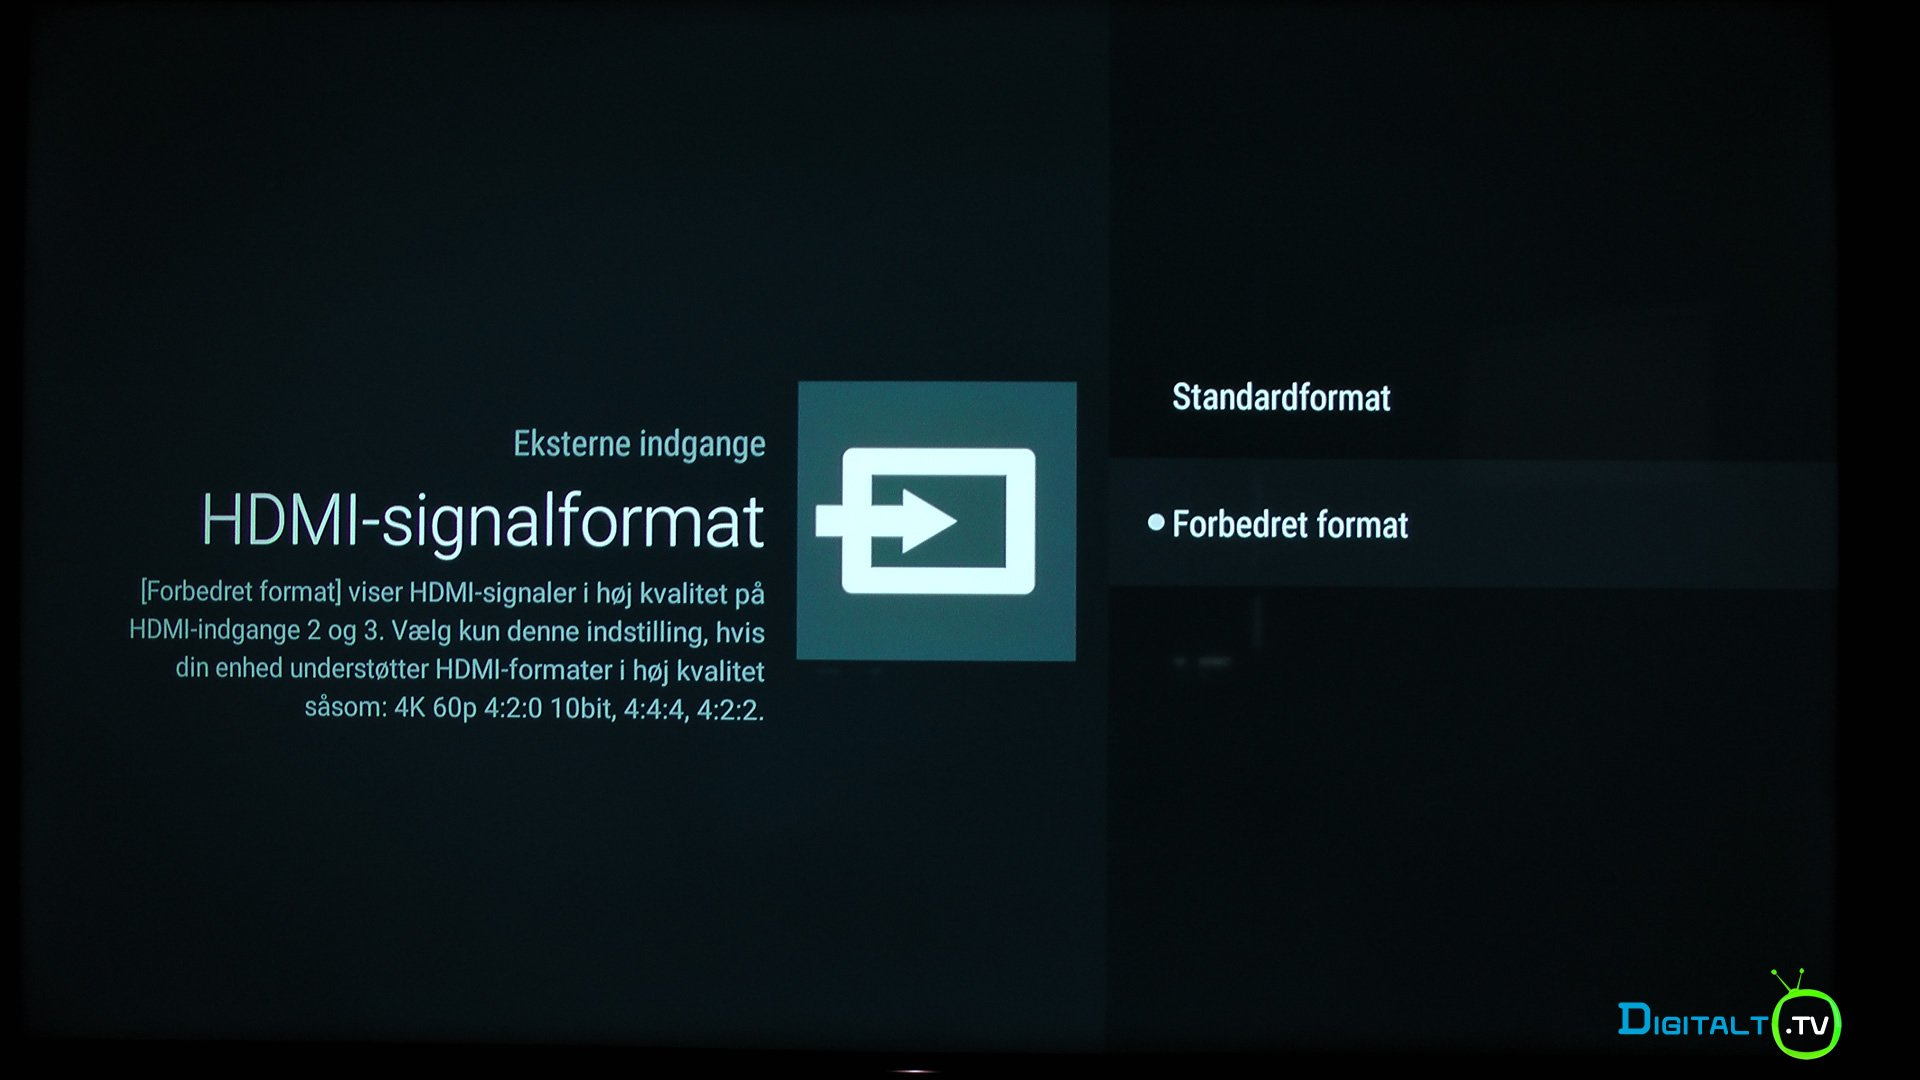 Sony XE9005 HDMI signalformat indstilling